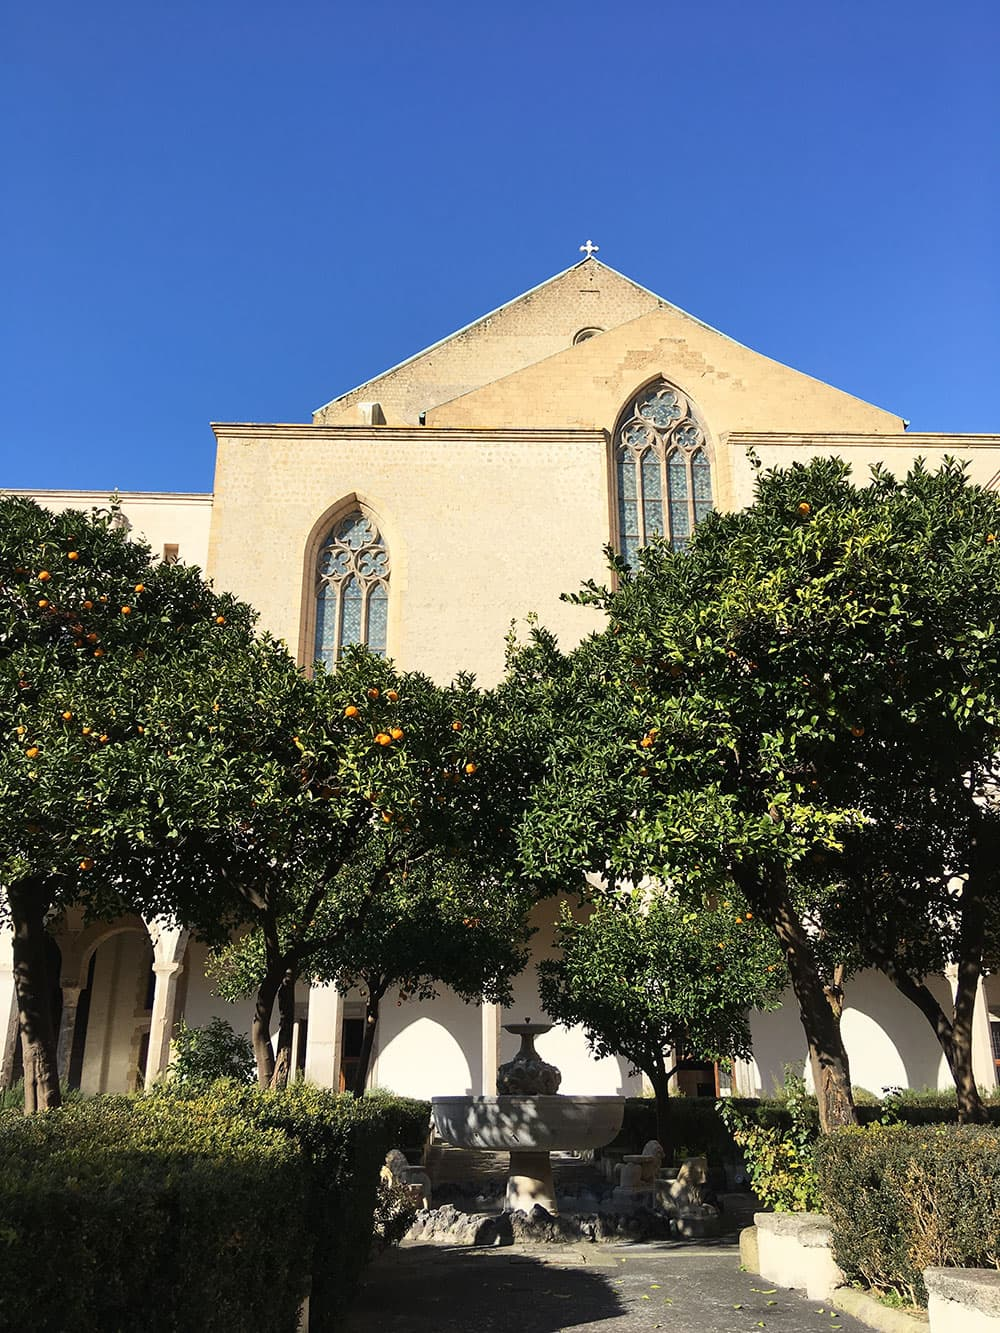 Mature orange trees in the Courtyard at Santa Chiara